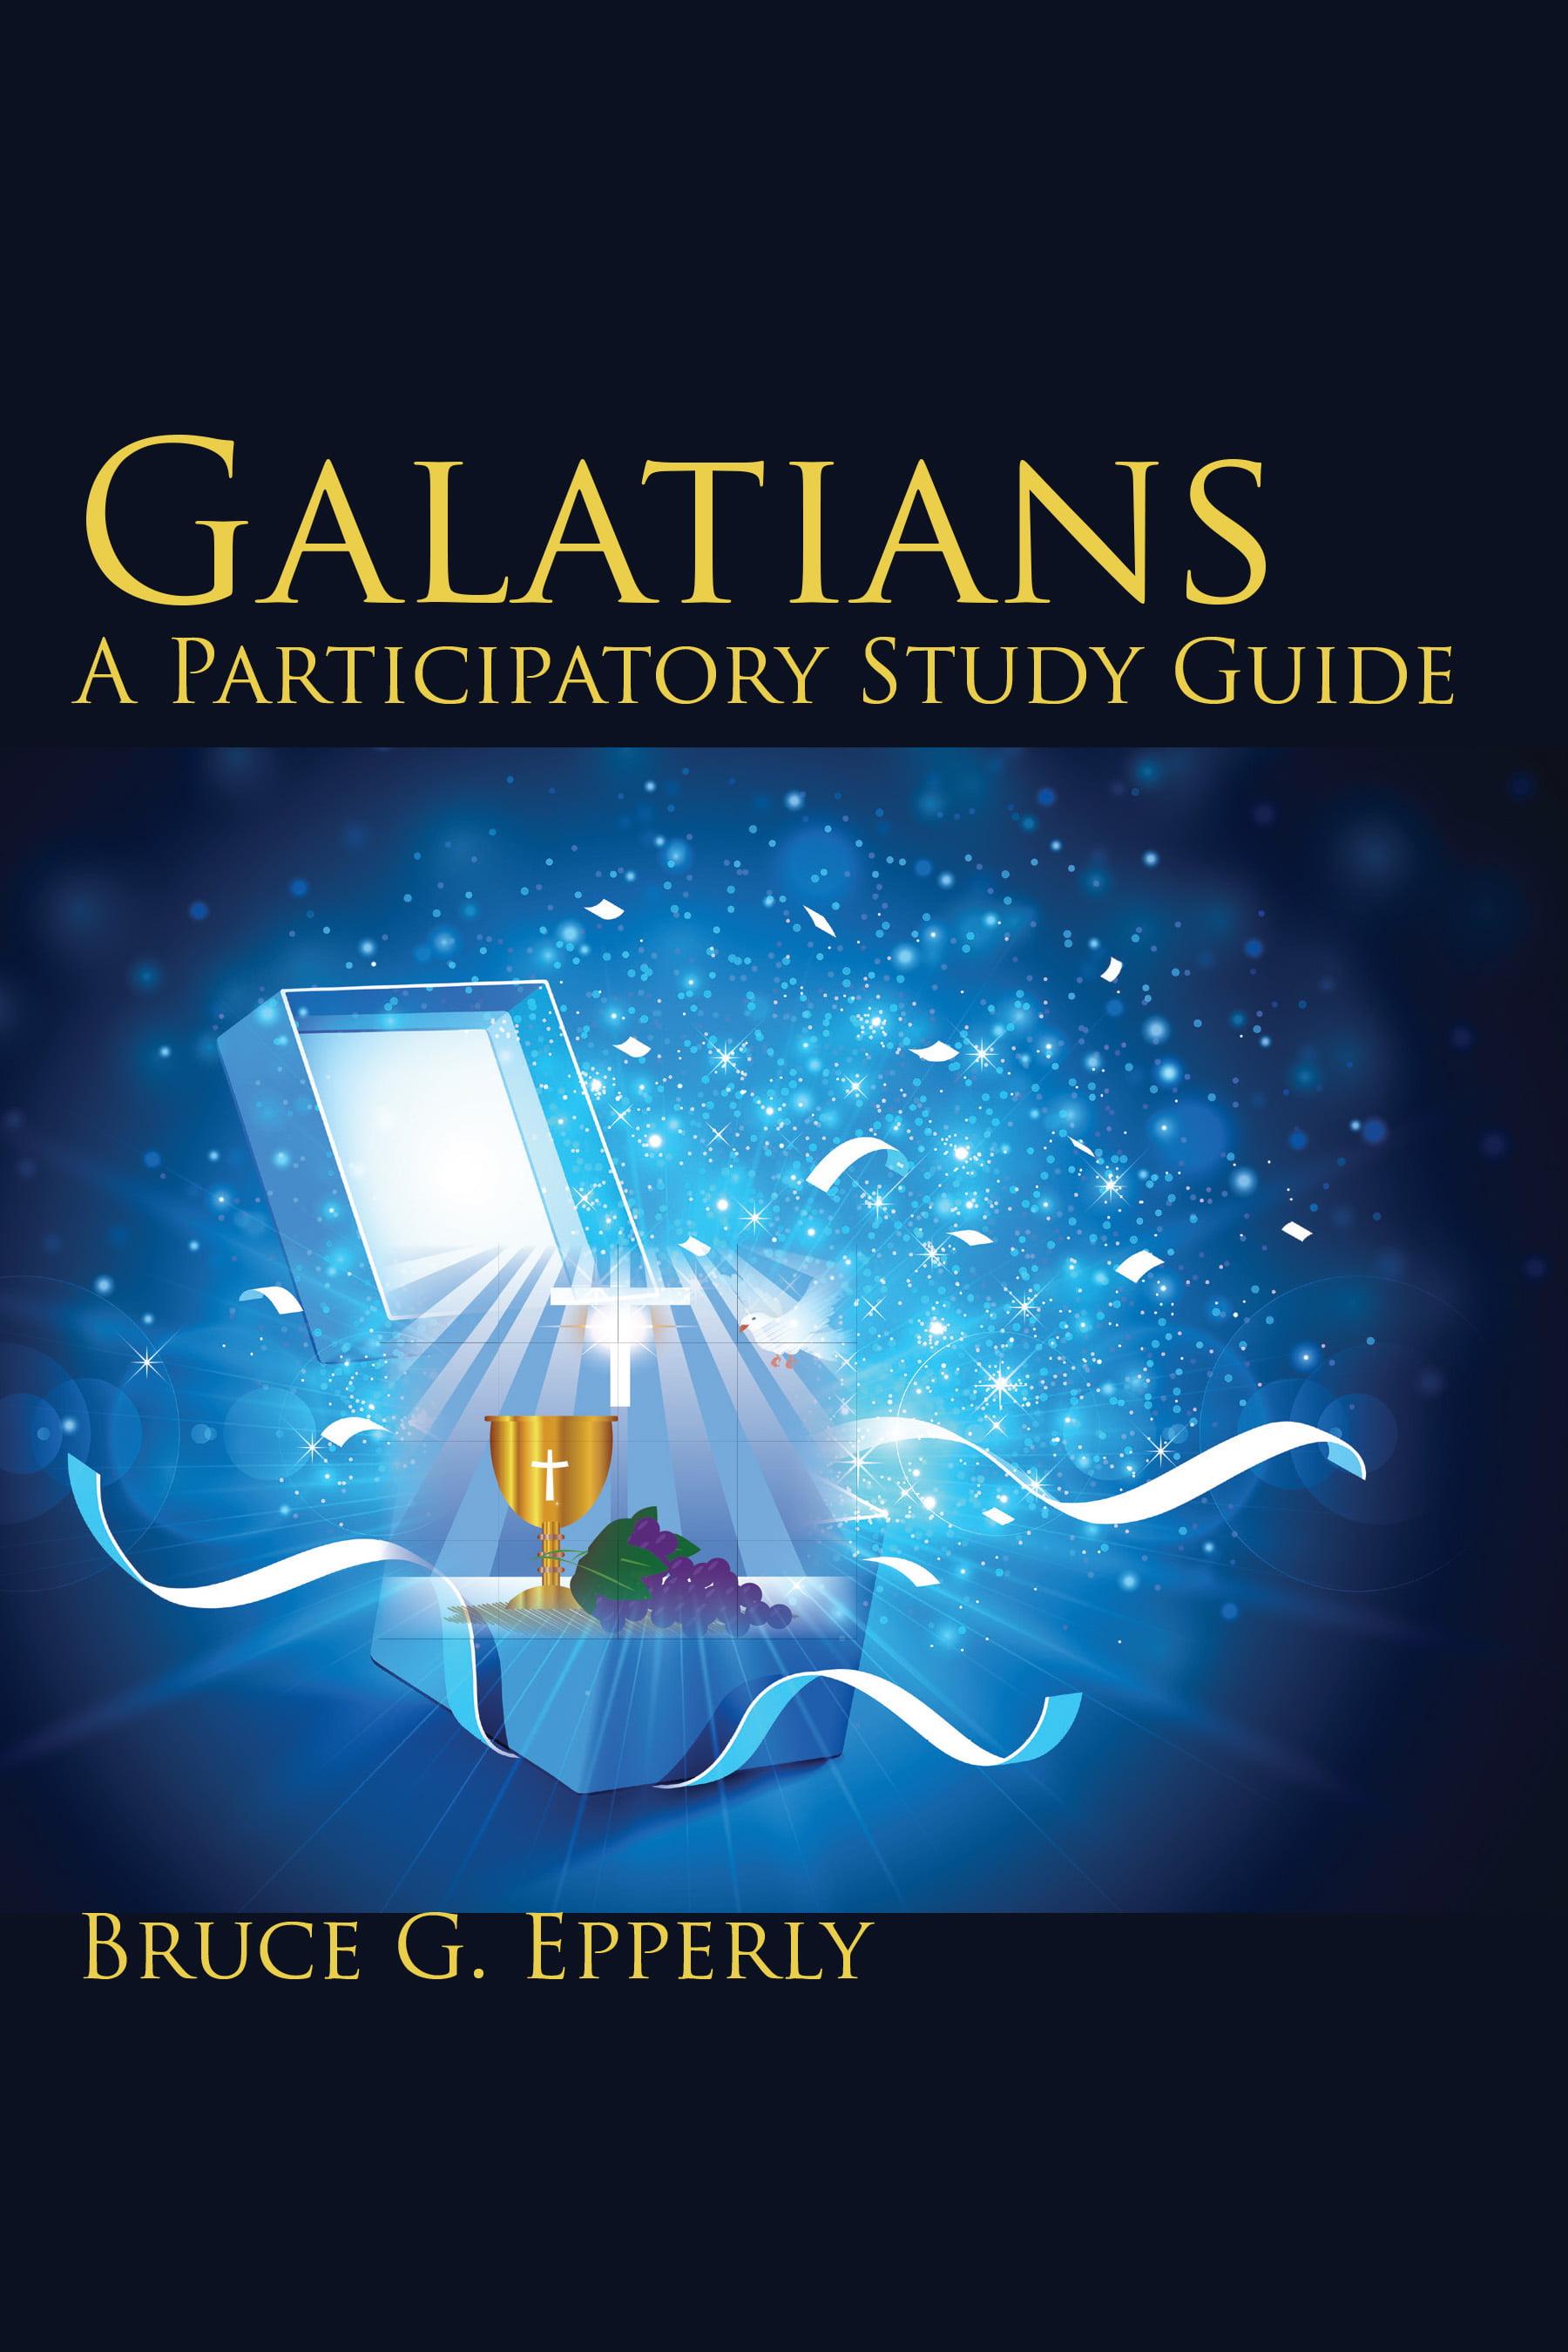 Galatians a participatory study guide